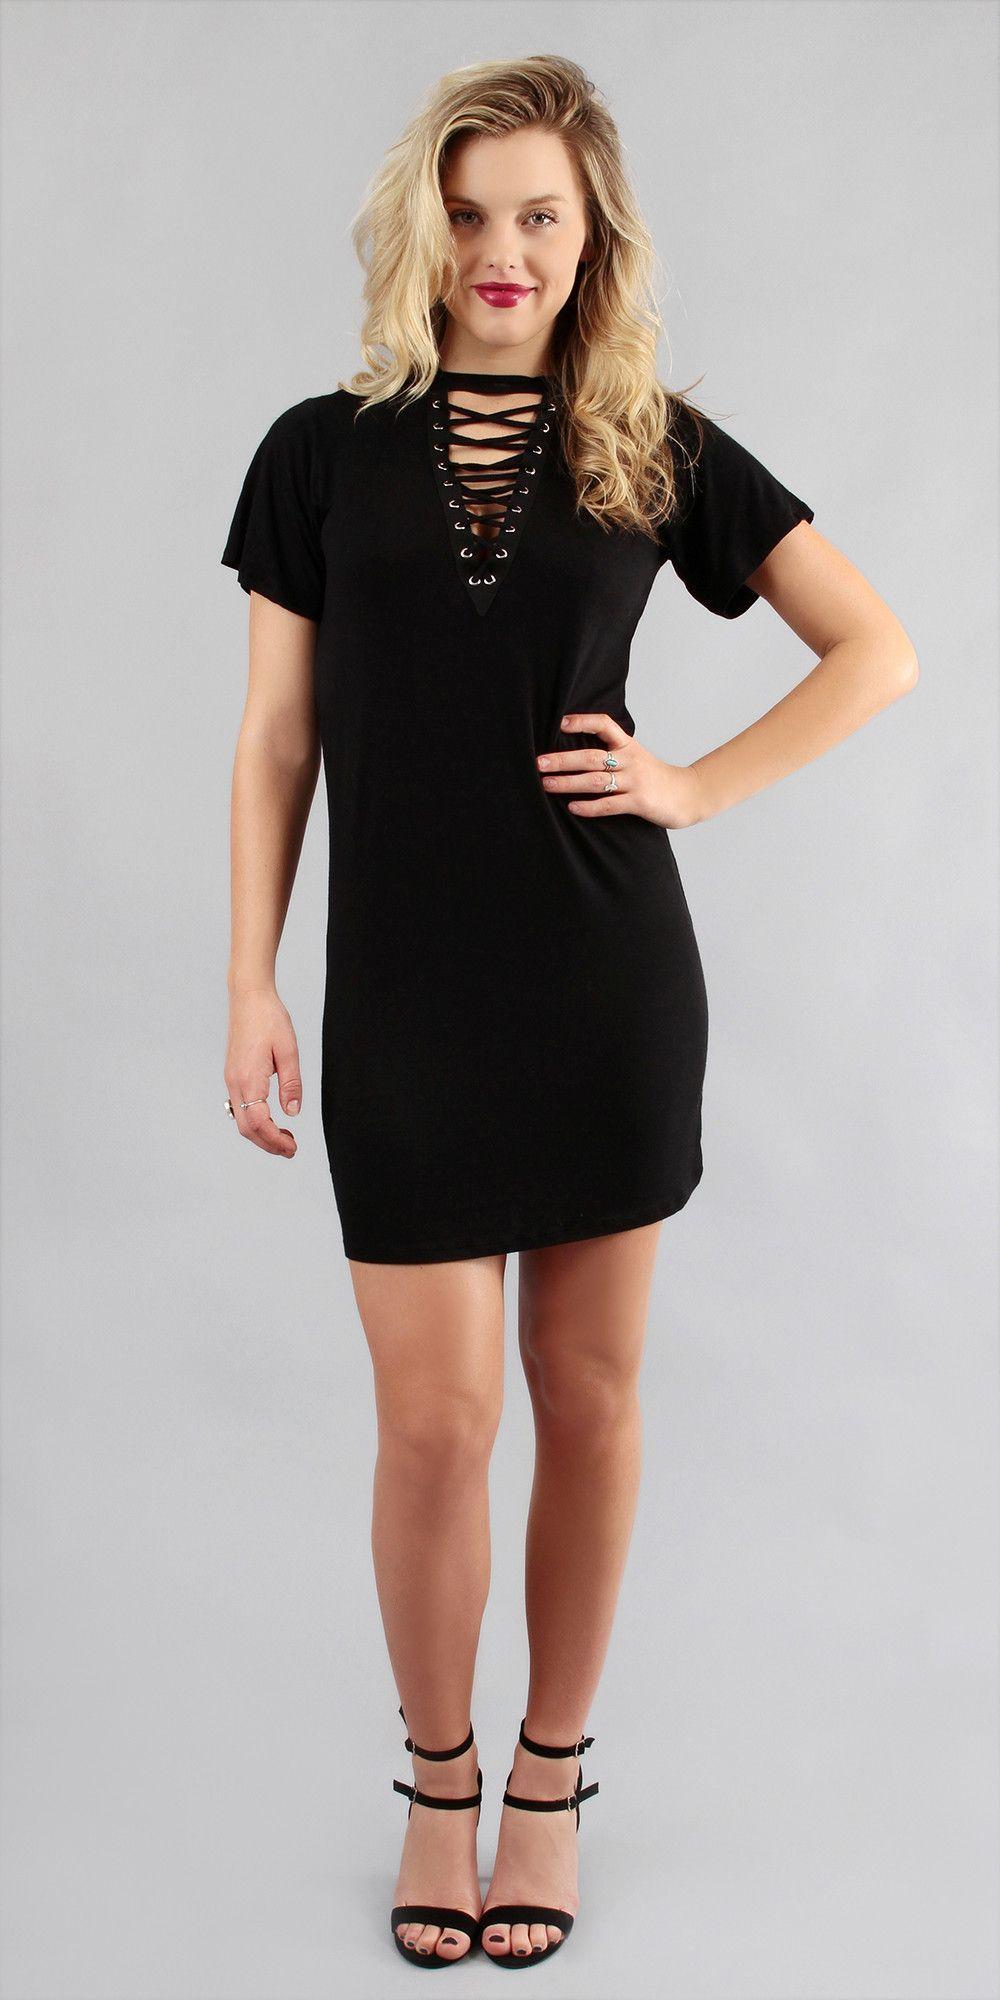 Lace front choker neck mini dress products